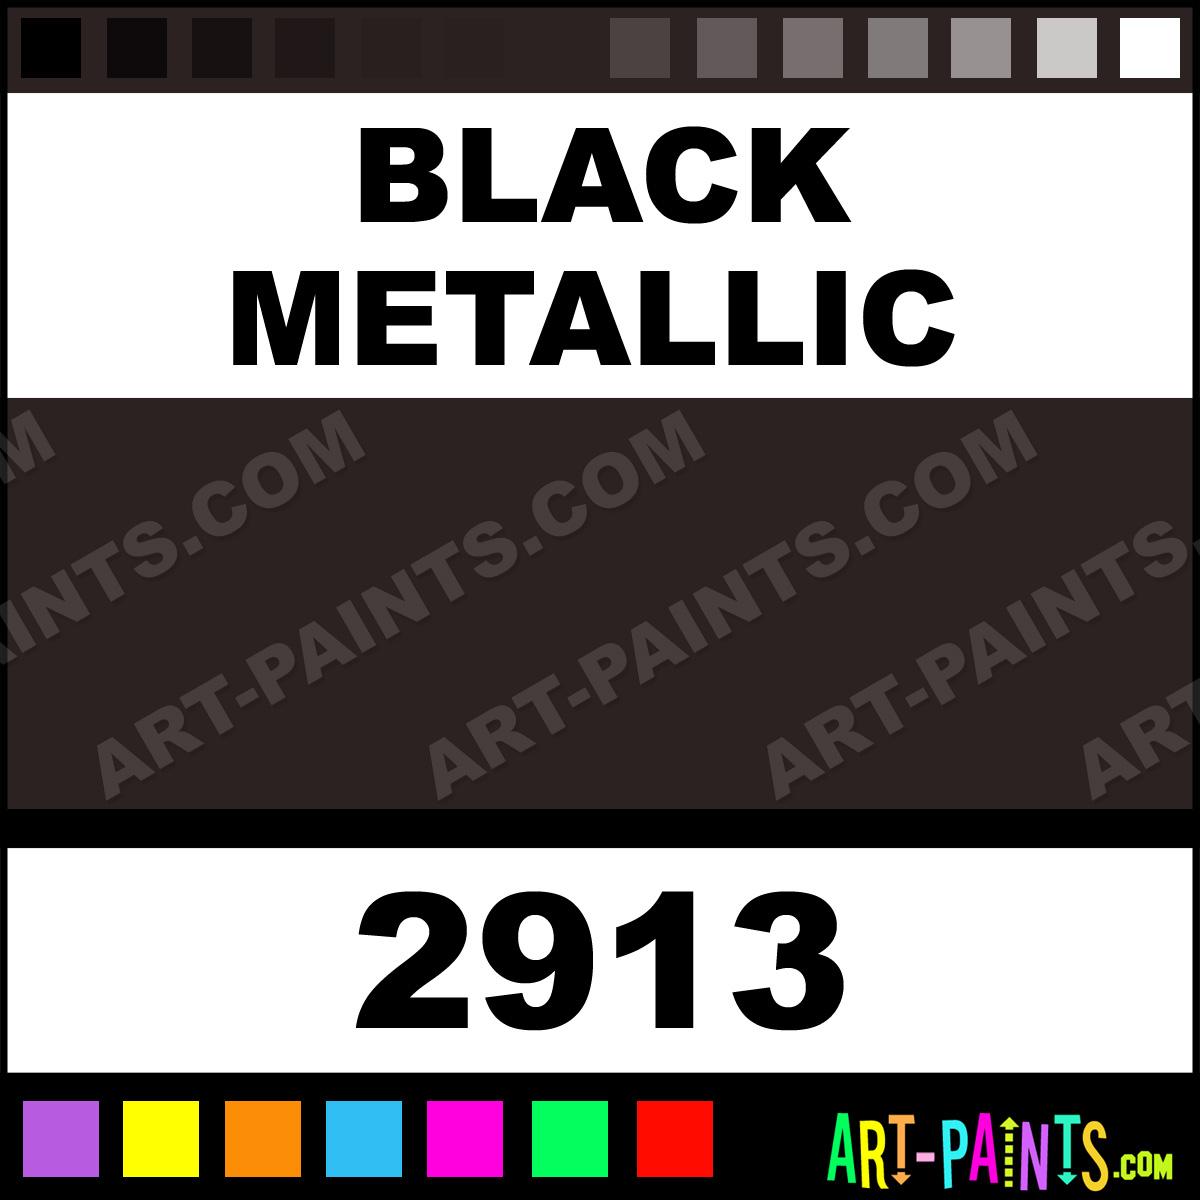 Black Metallic Car And Truck Enamel Spray Paints 2913 Black Metallic Paint Black Metallic